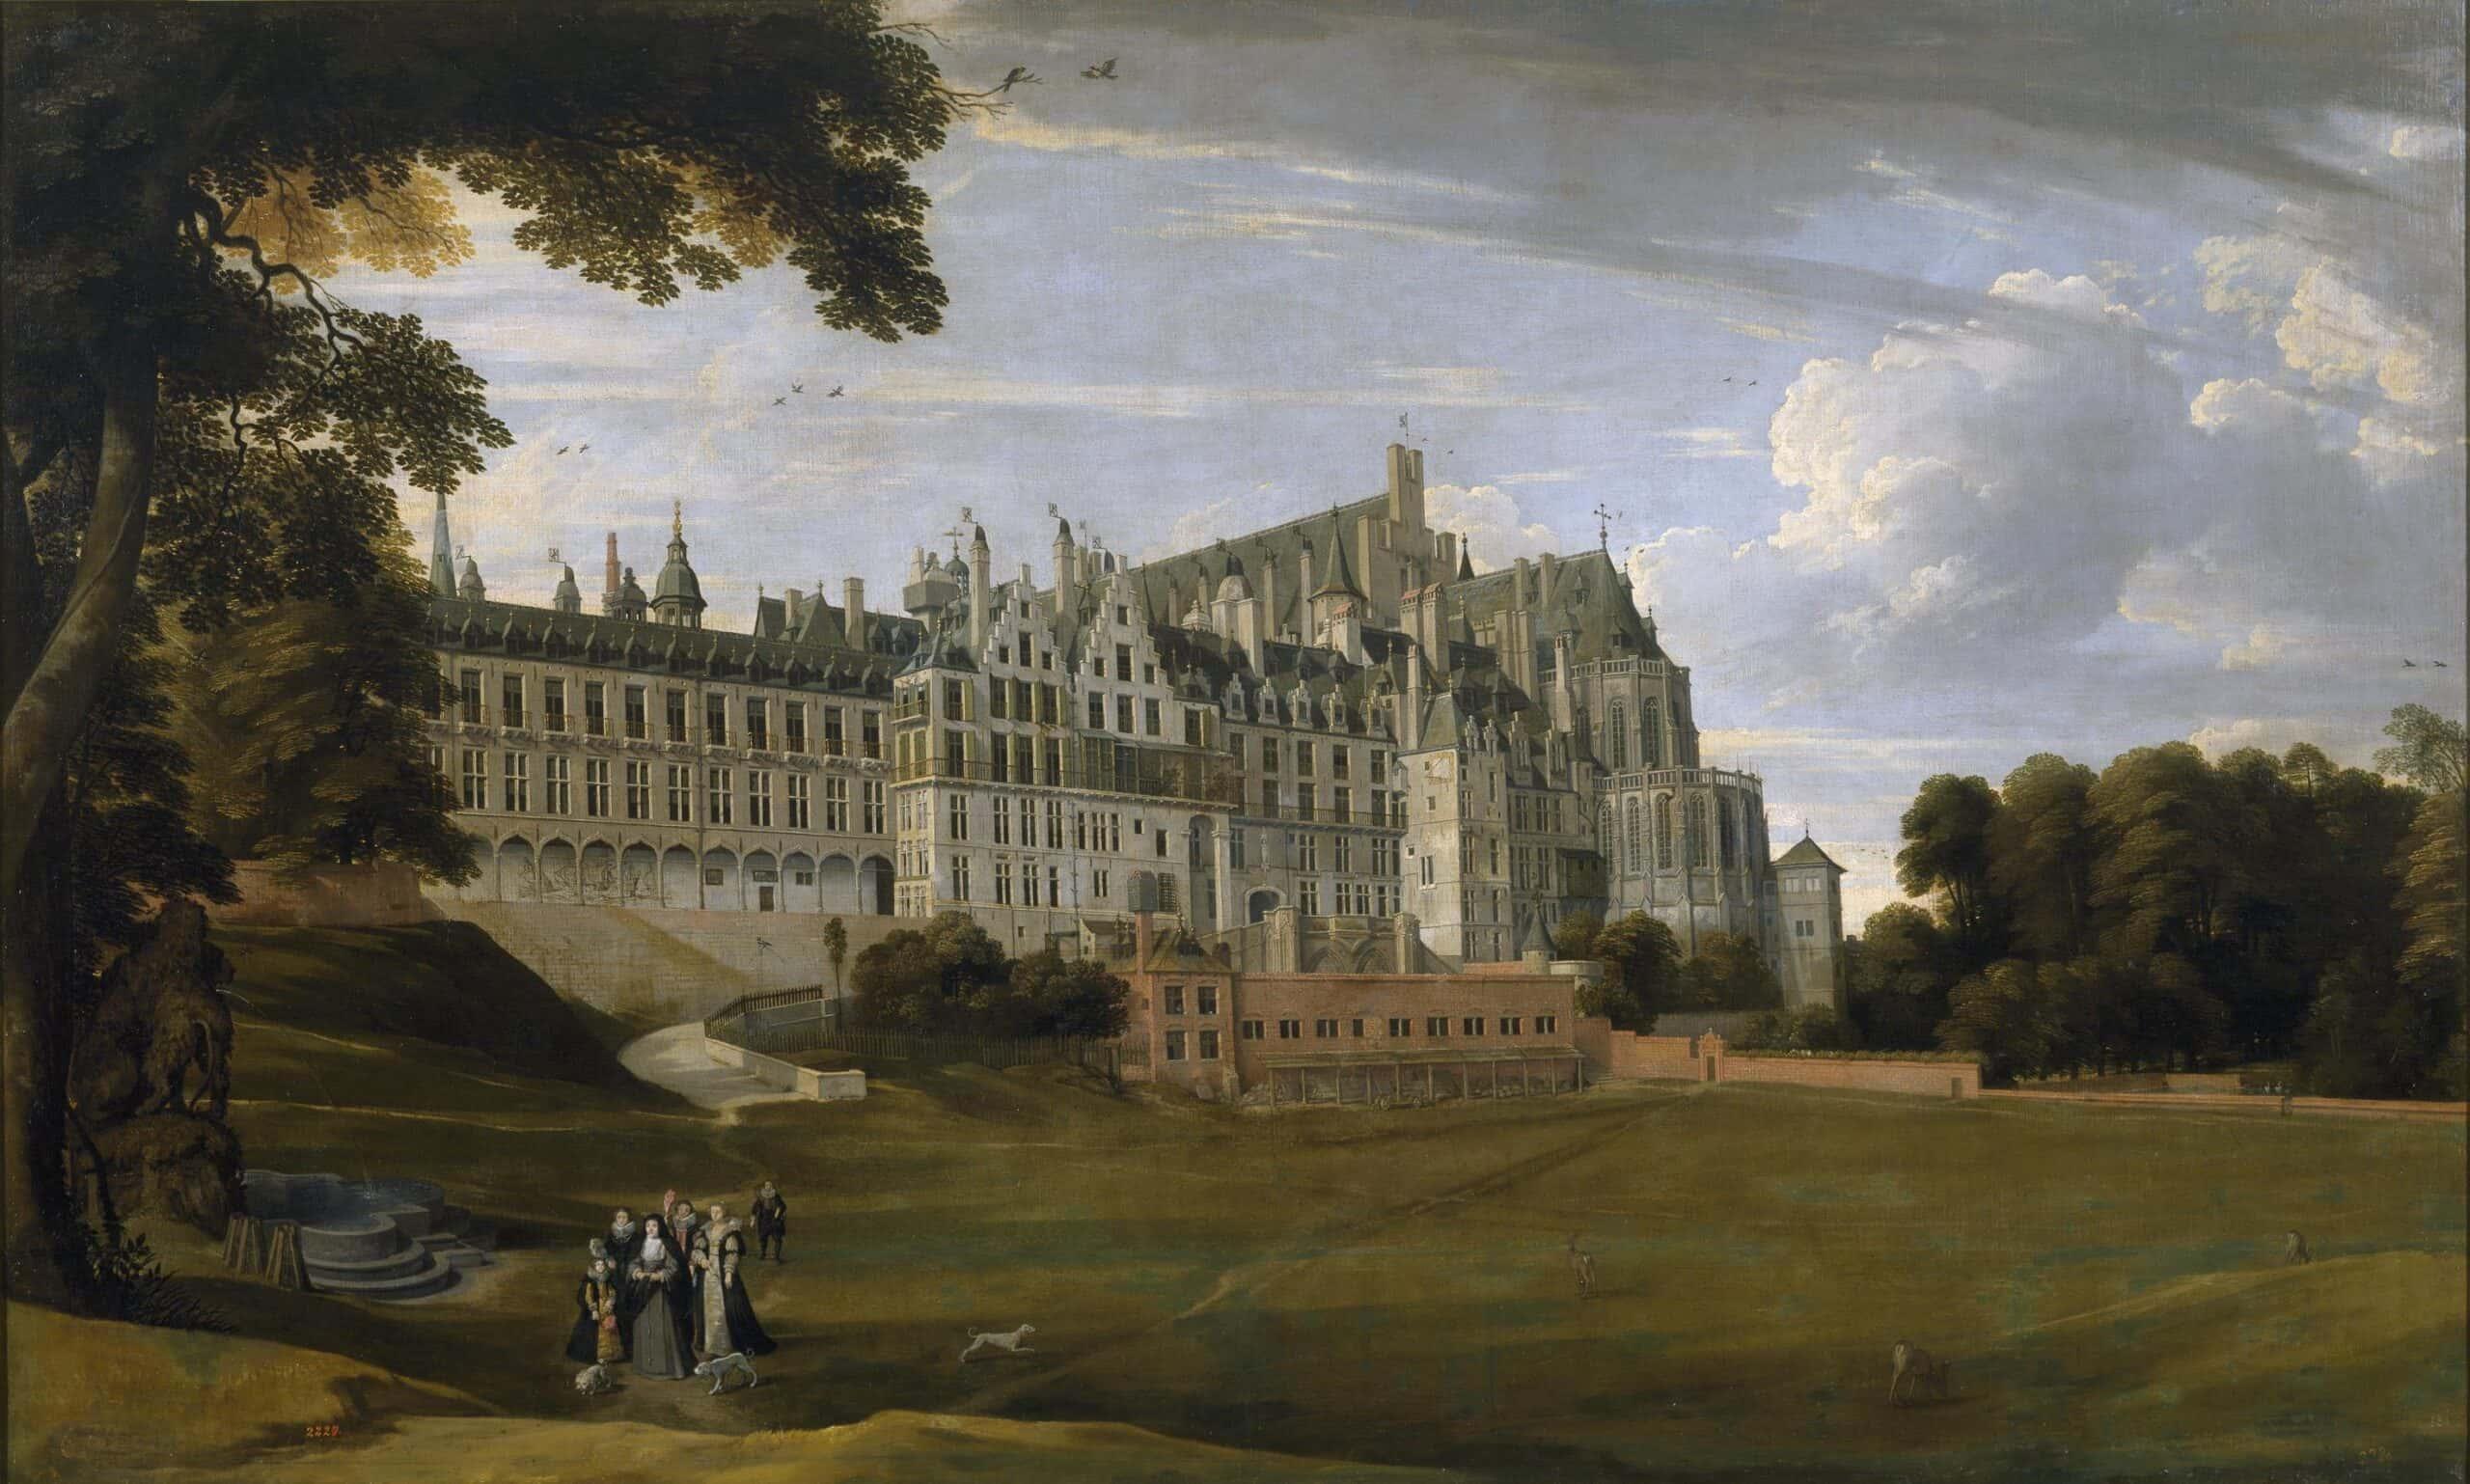 Joanna of Castile Facts